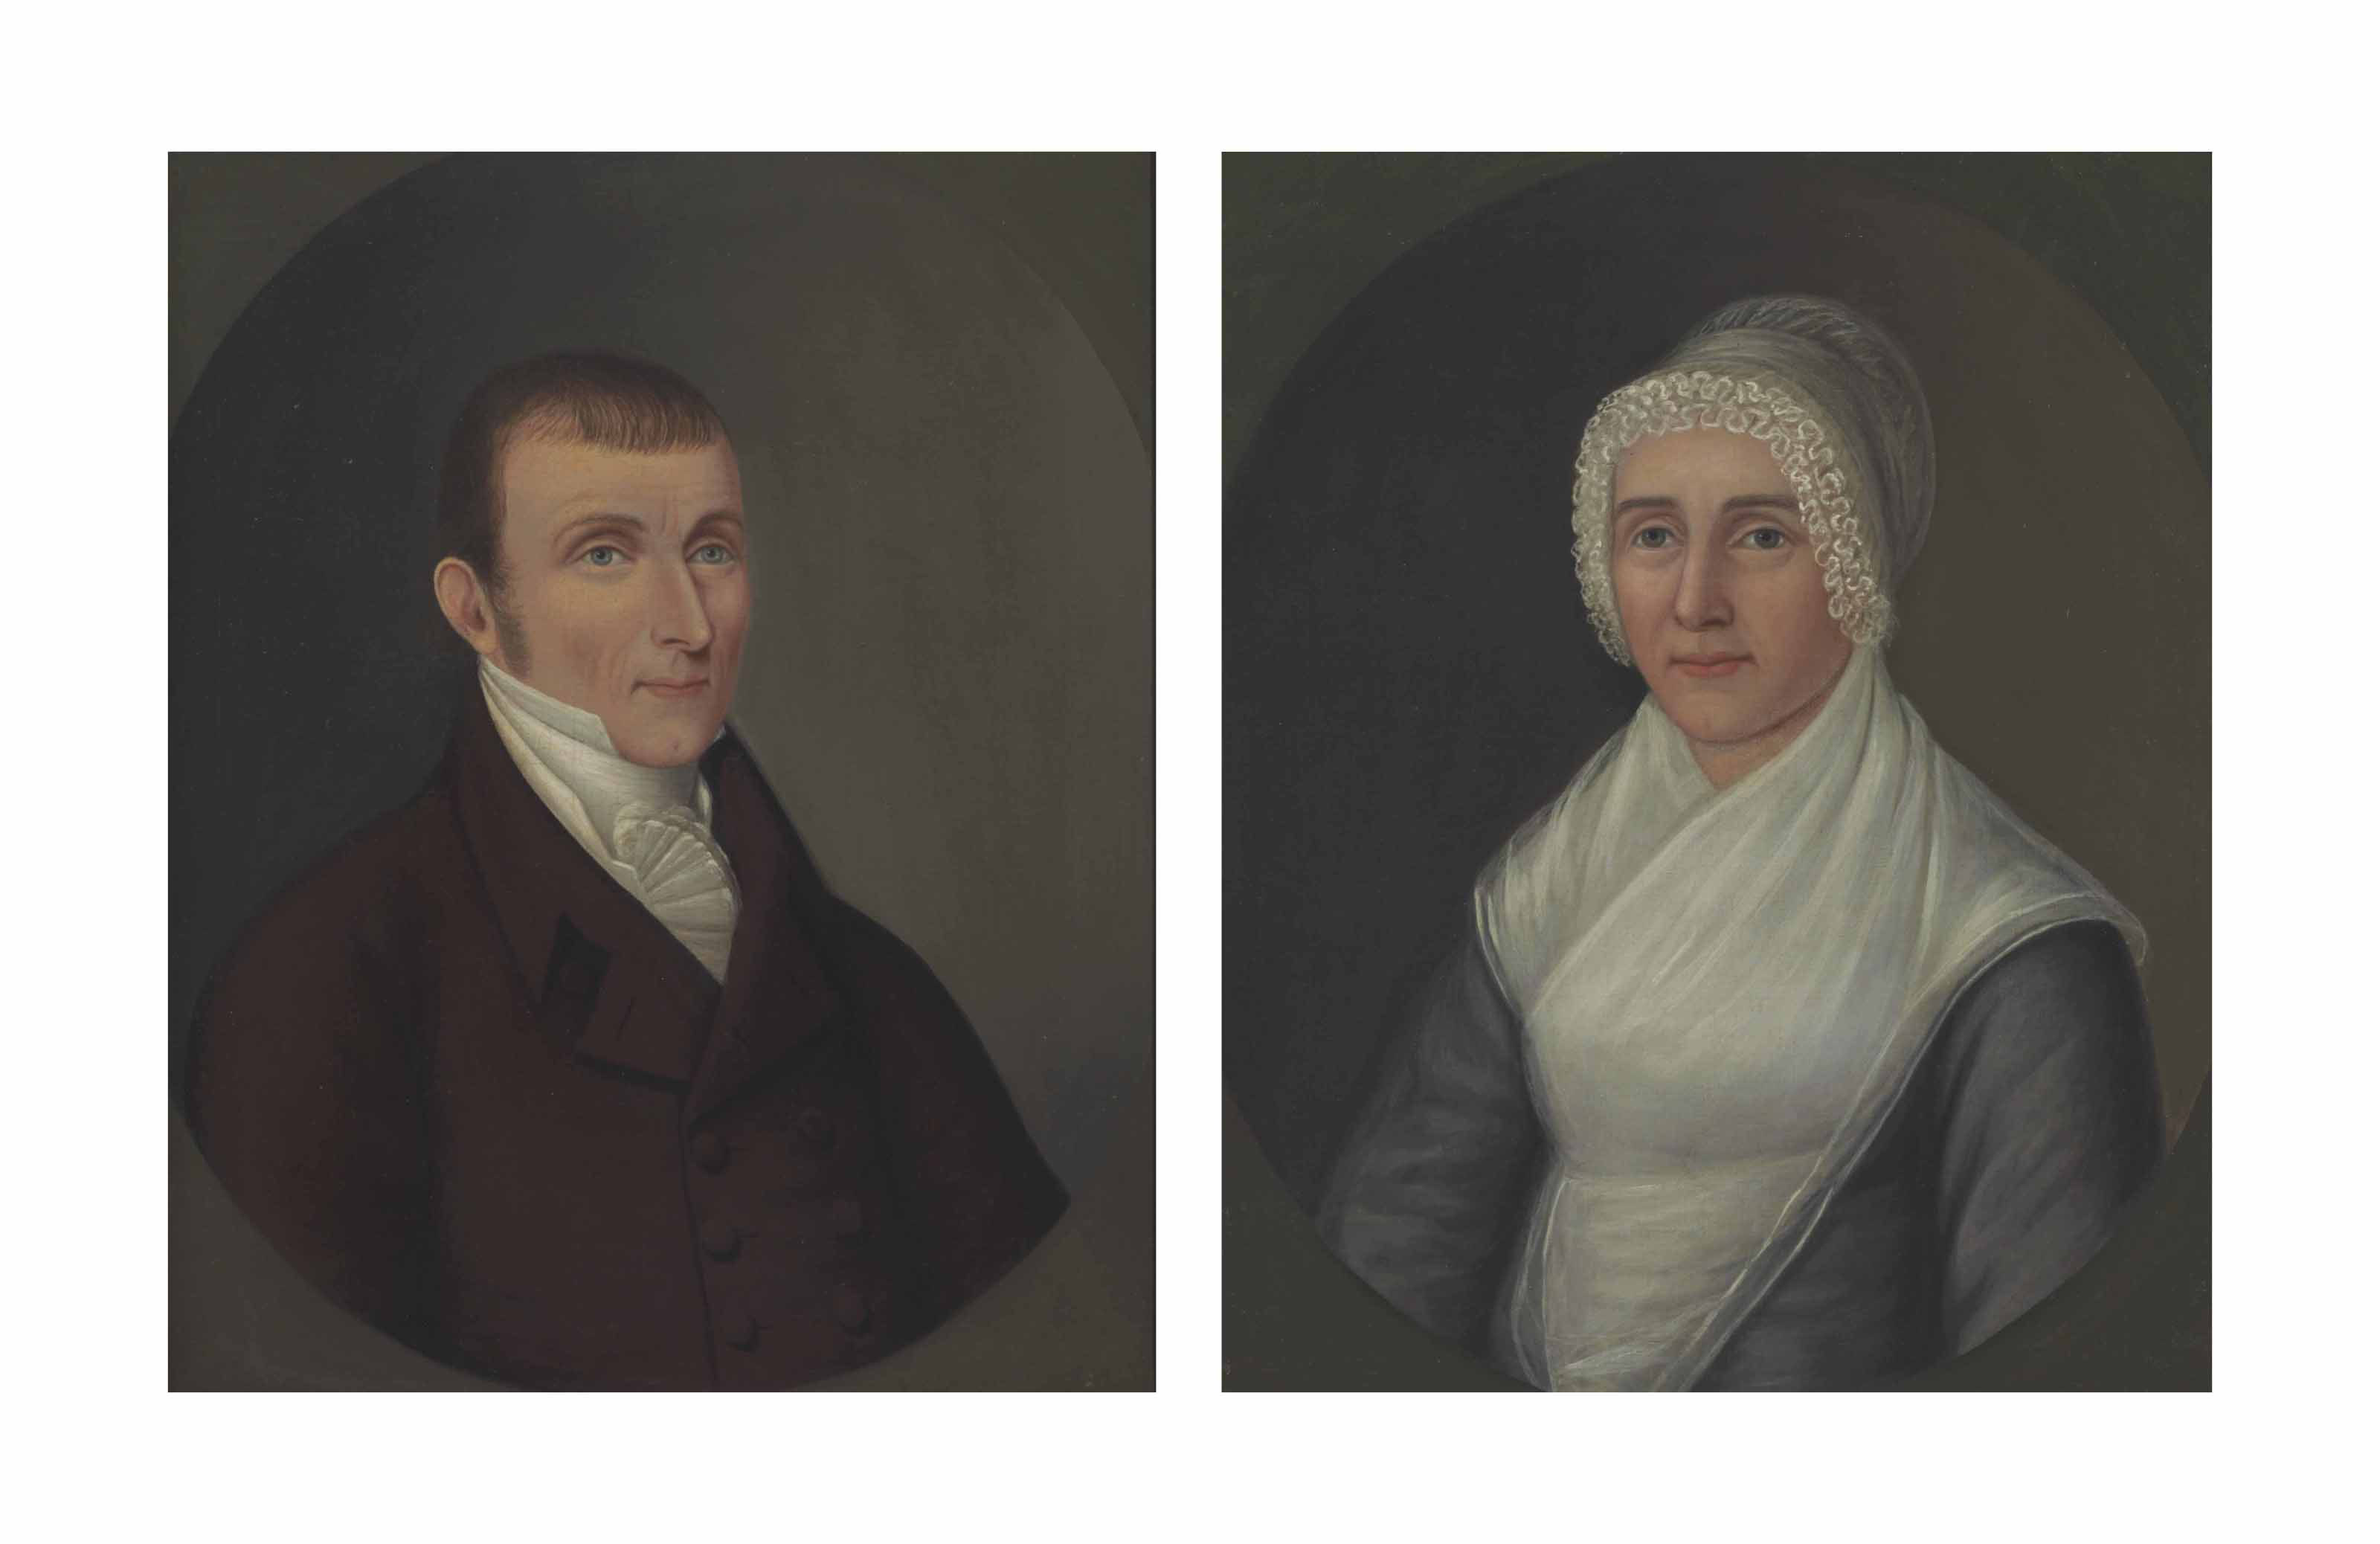 Joshua Johnson (1765-1830)